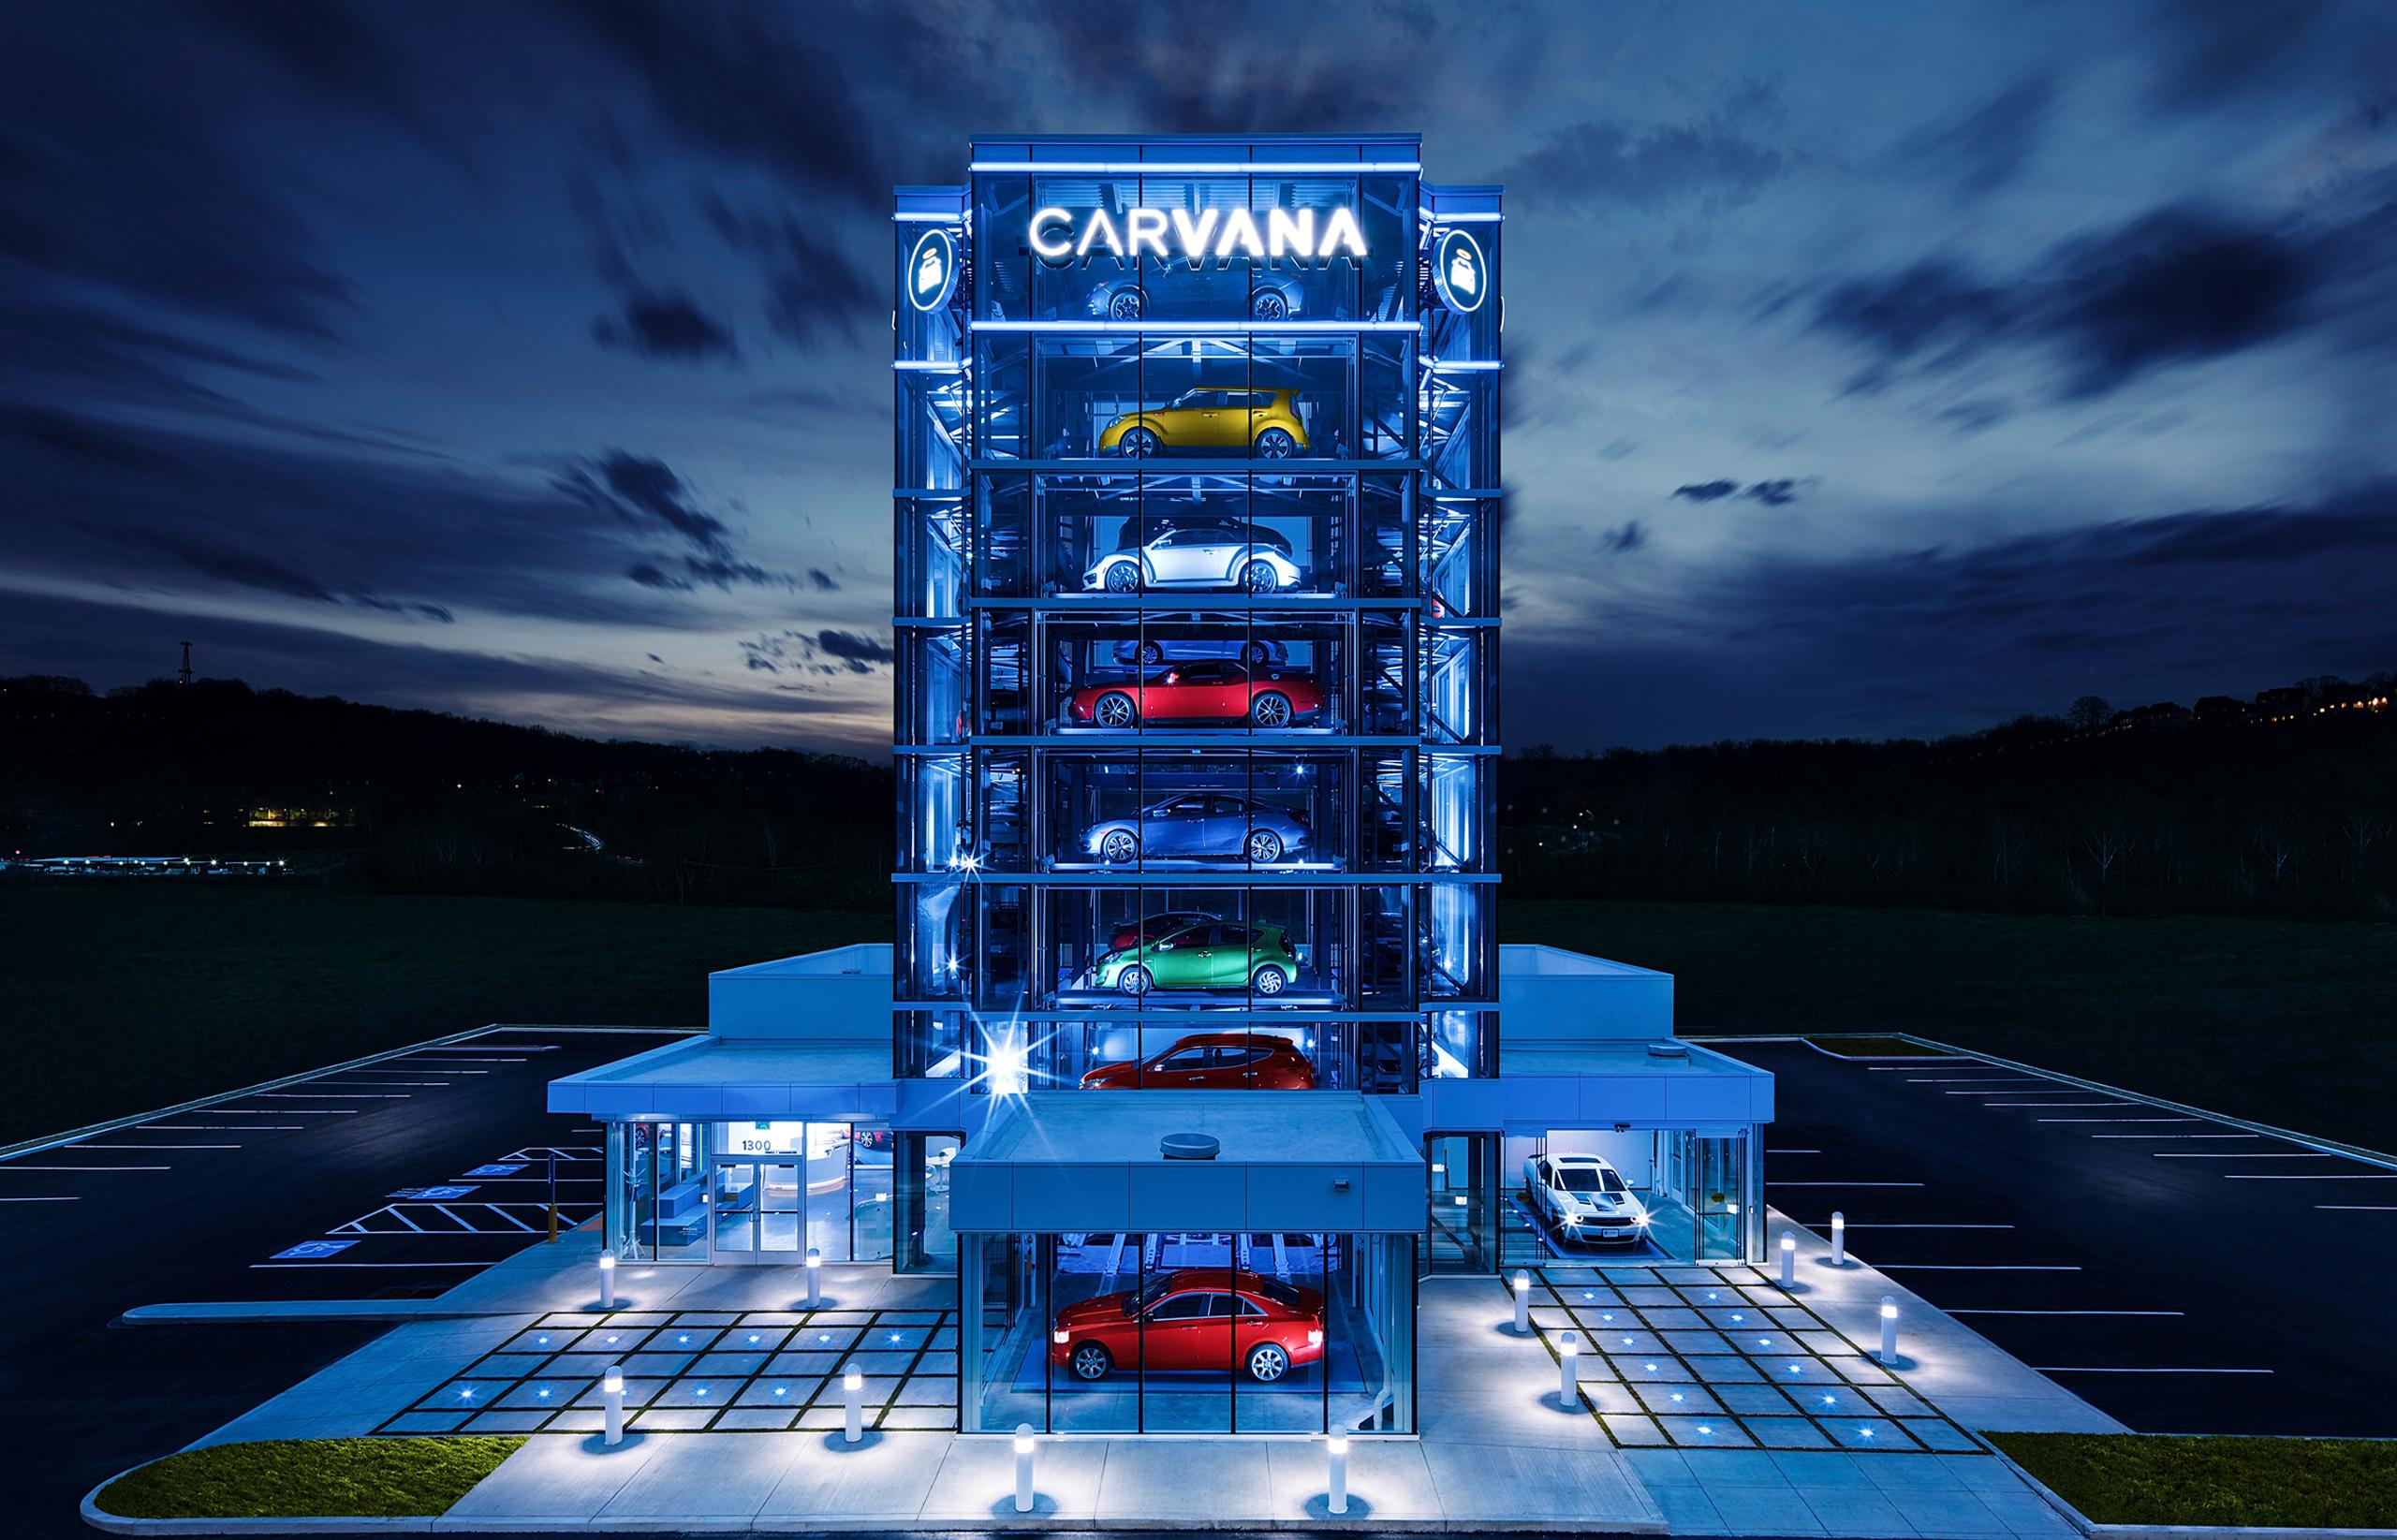 Carvana's Pittsburgh vending machine holding 27 vehicles.